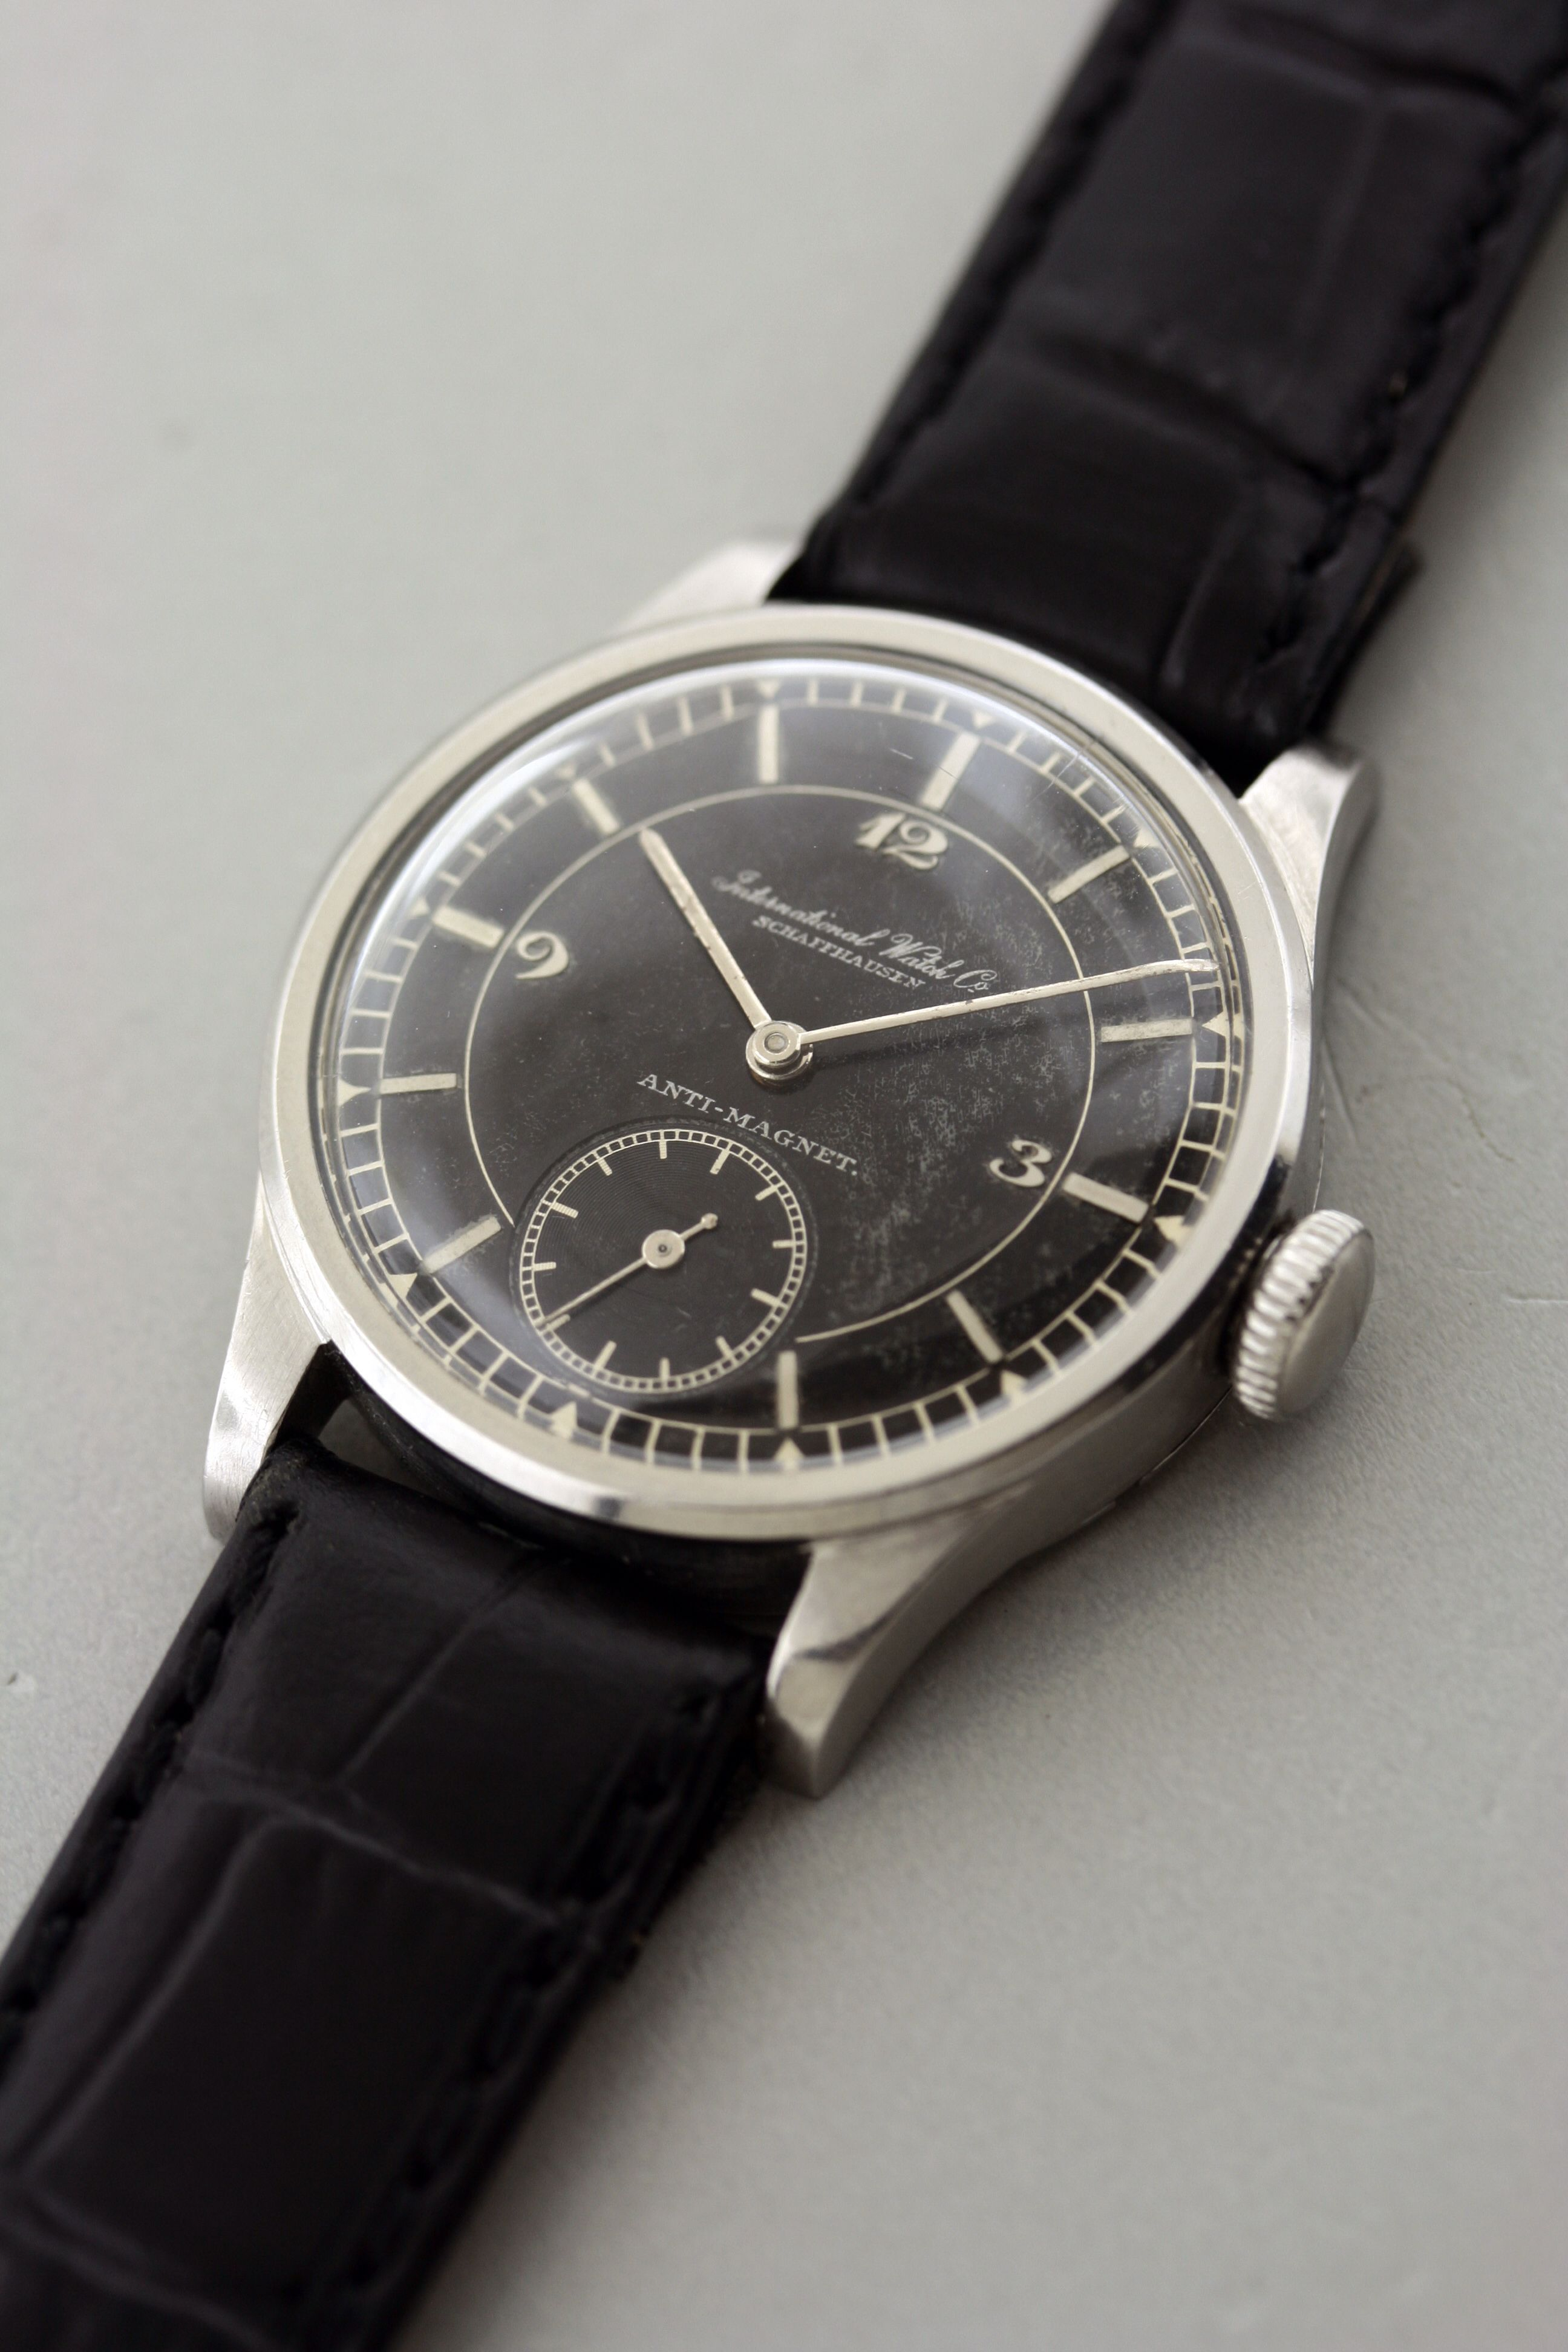 f3e7c50ca2b9 IWC 1940 s Men s Casual Fashion, Iwc, Vintage Watches, Seiko, Cool Watches,